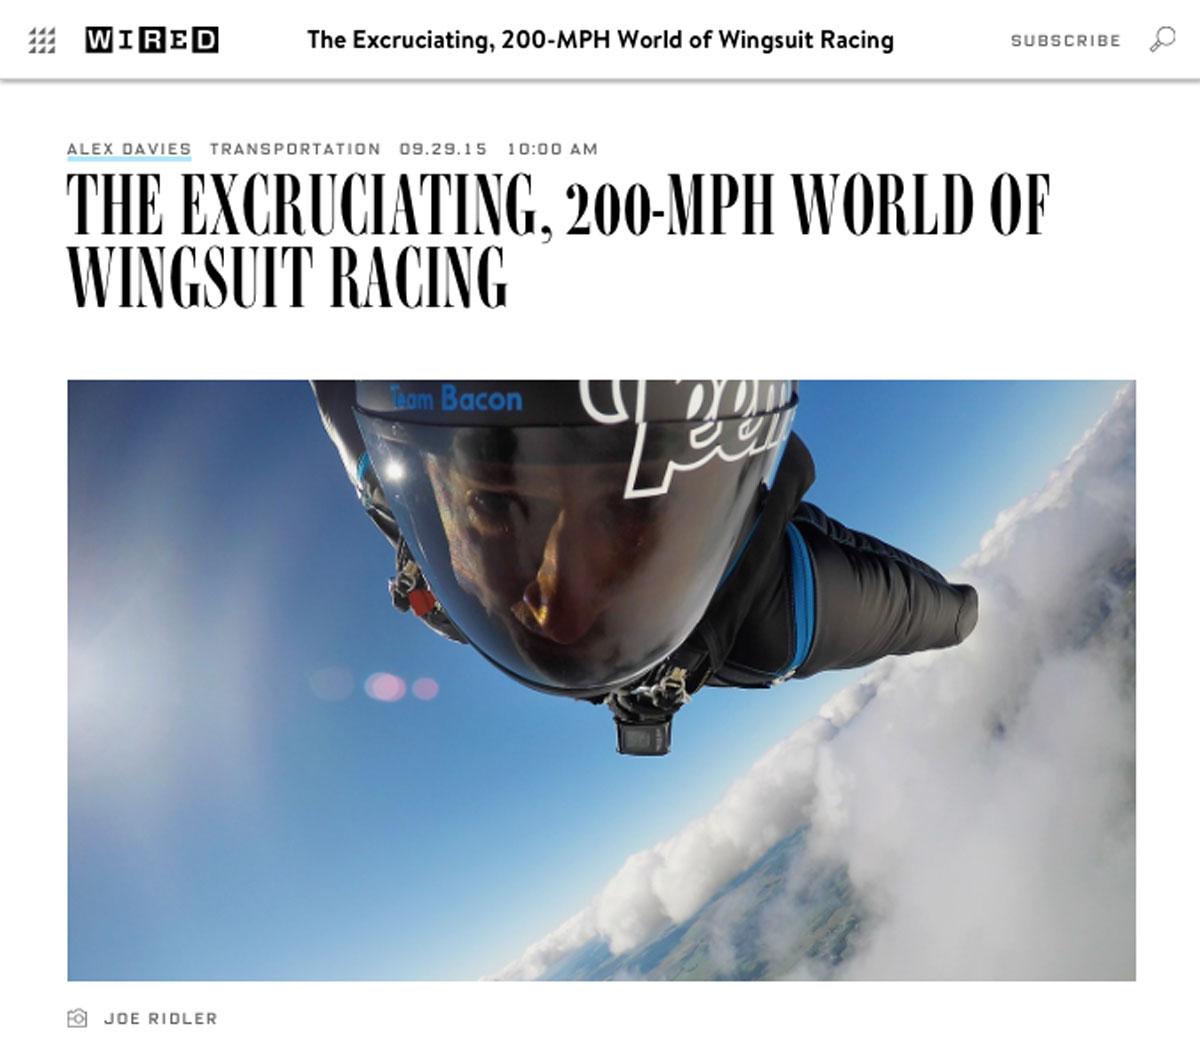 Wired Magazine Article - Joe Ridler - 2015